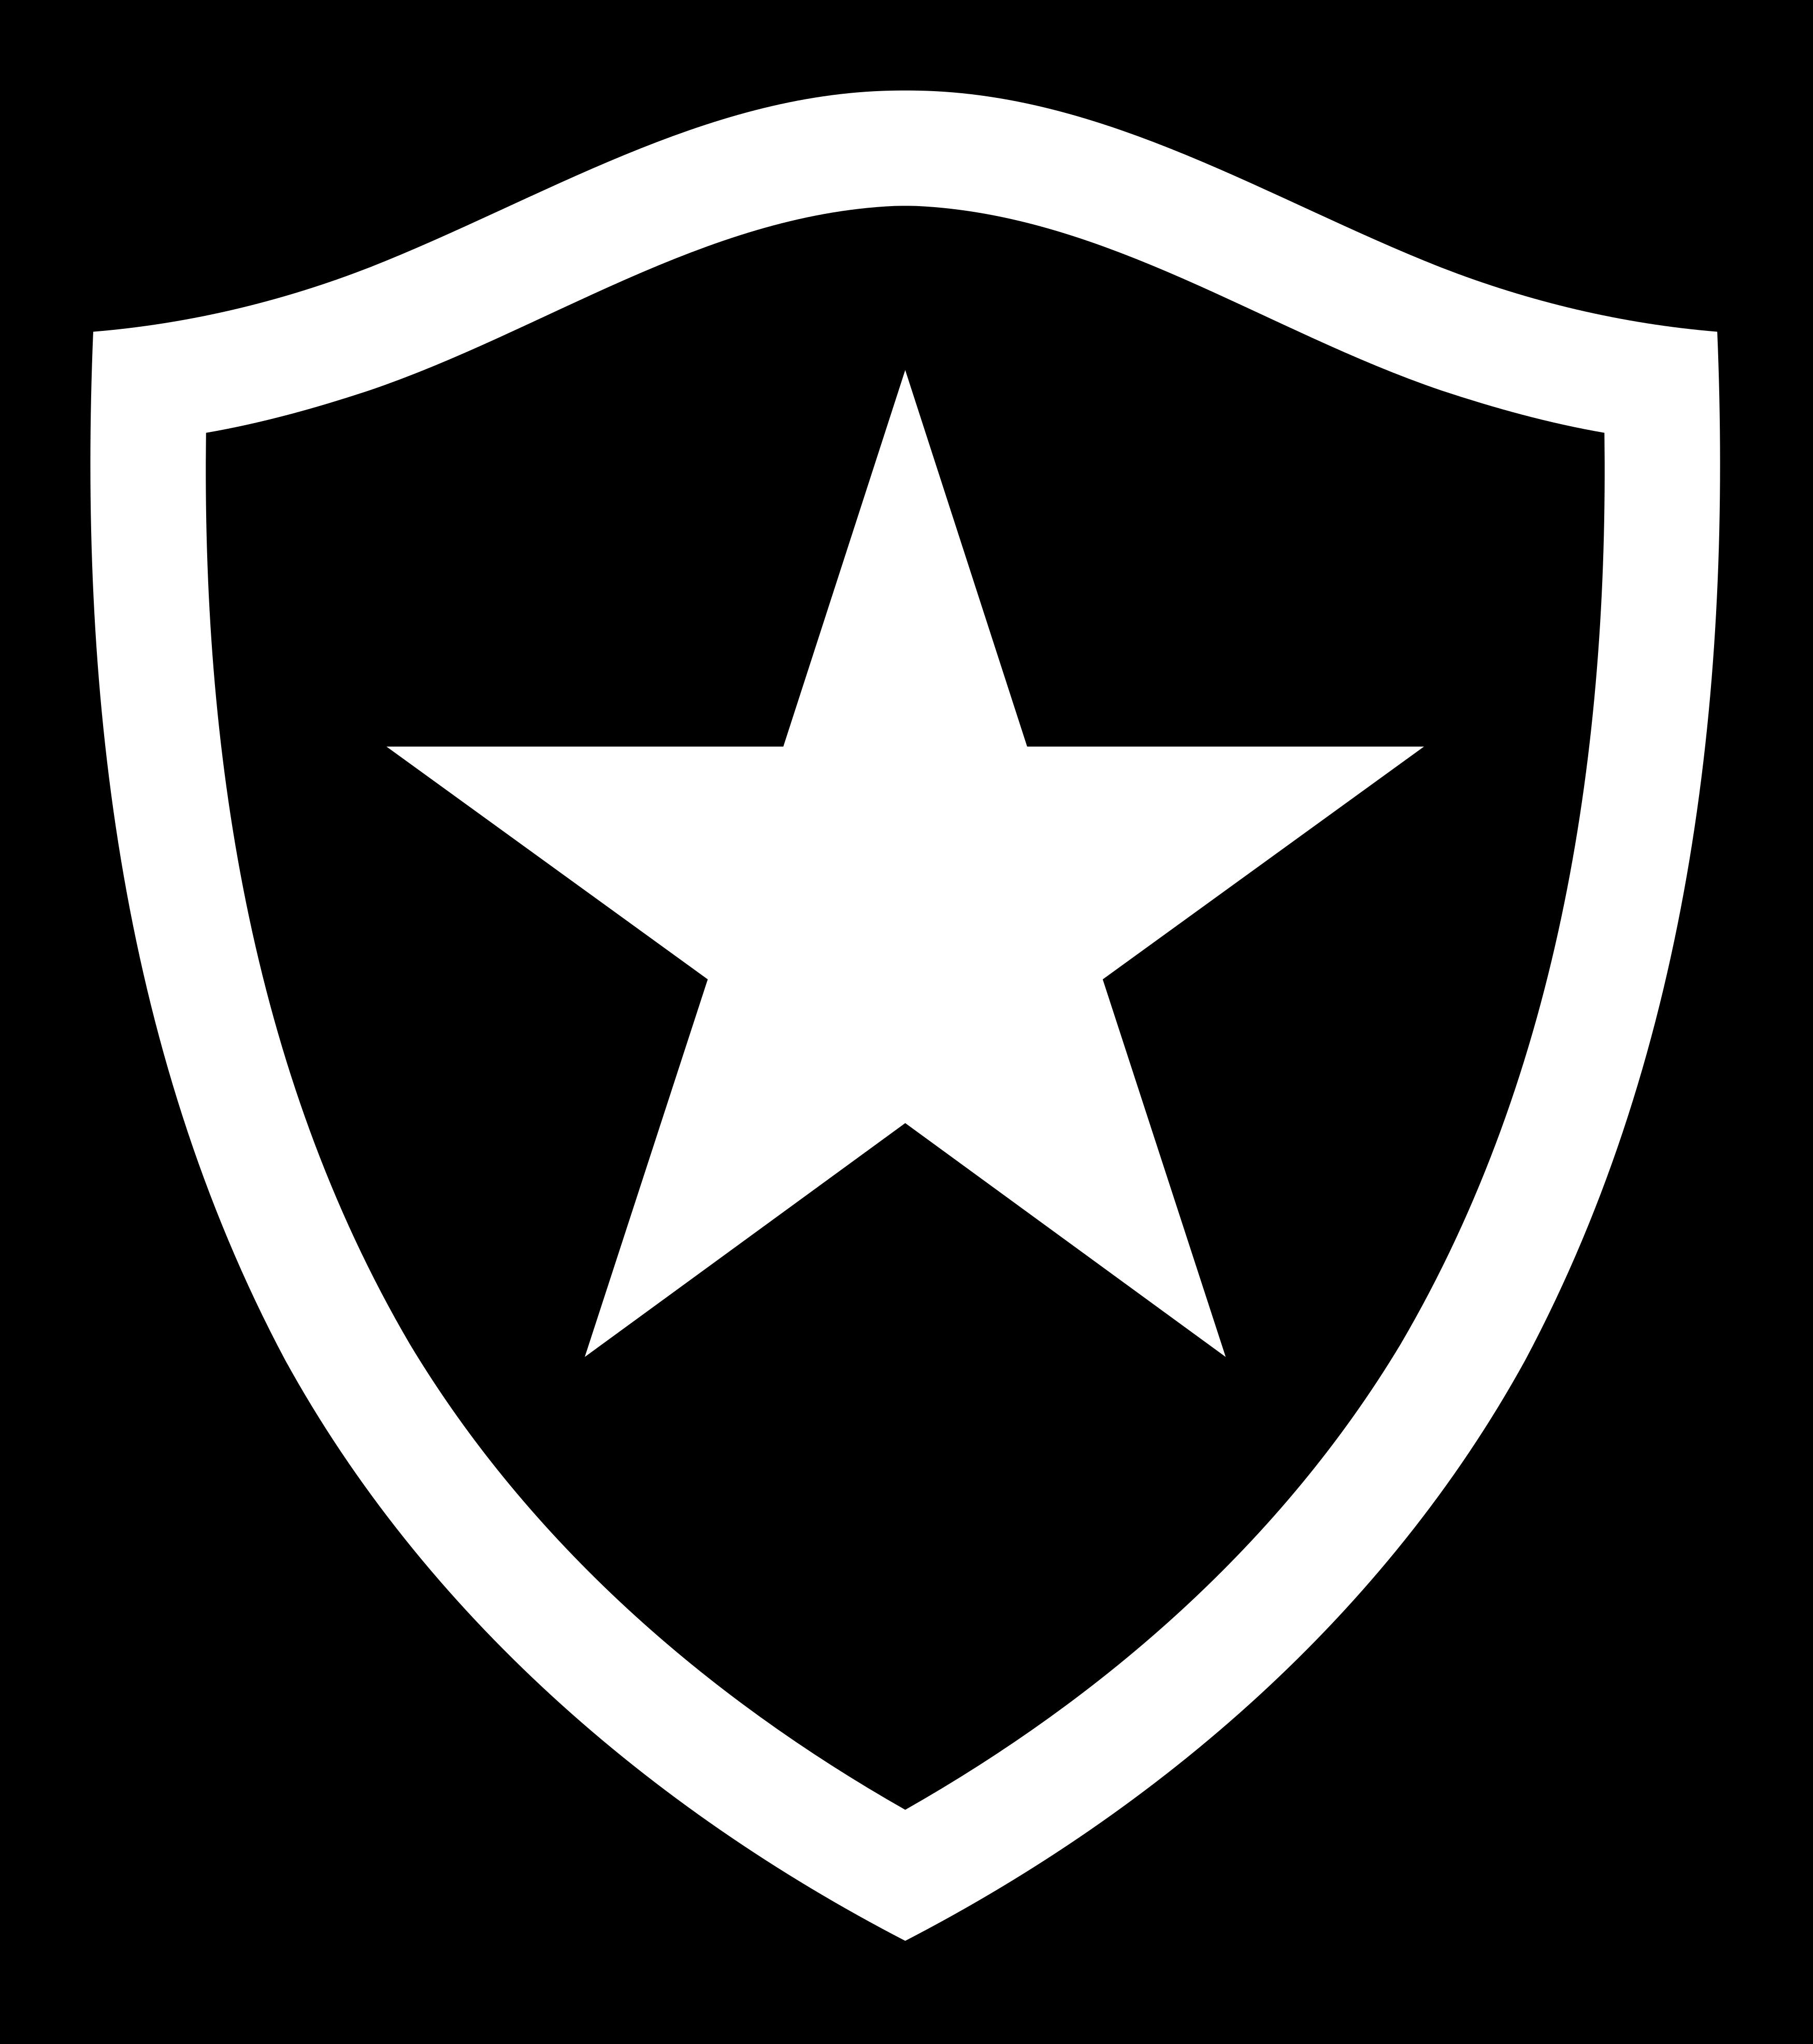 botafogo logo escudo - Botafogo Logo - Escudo